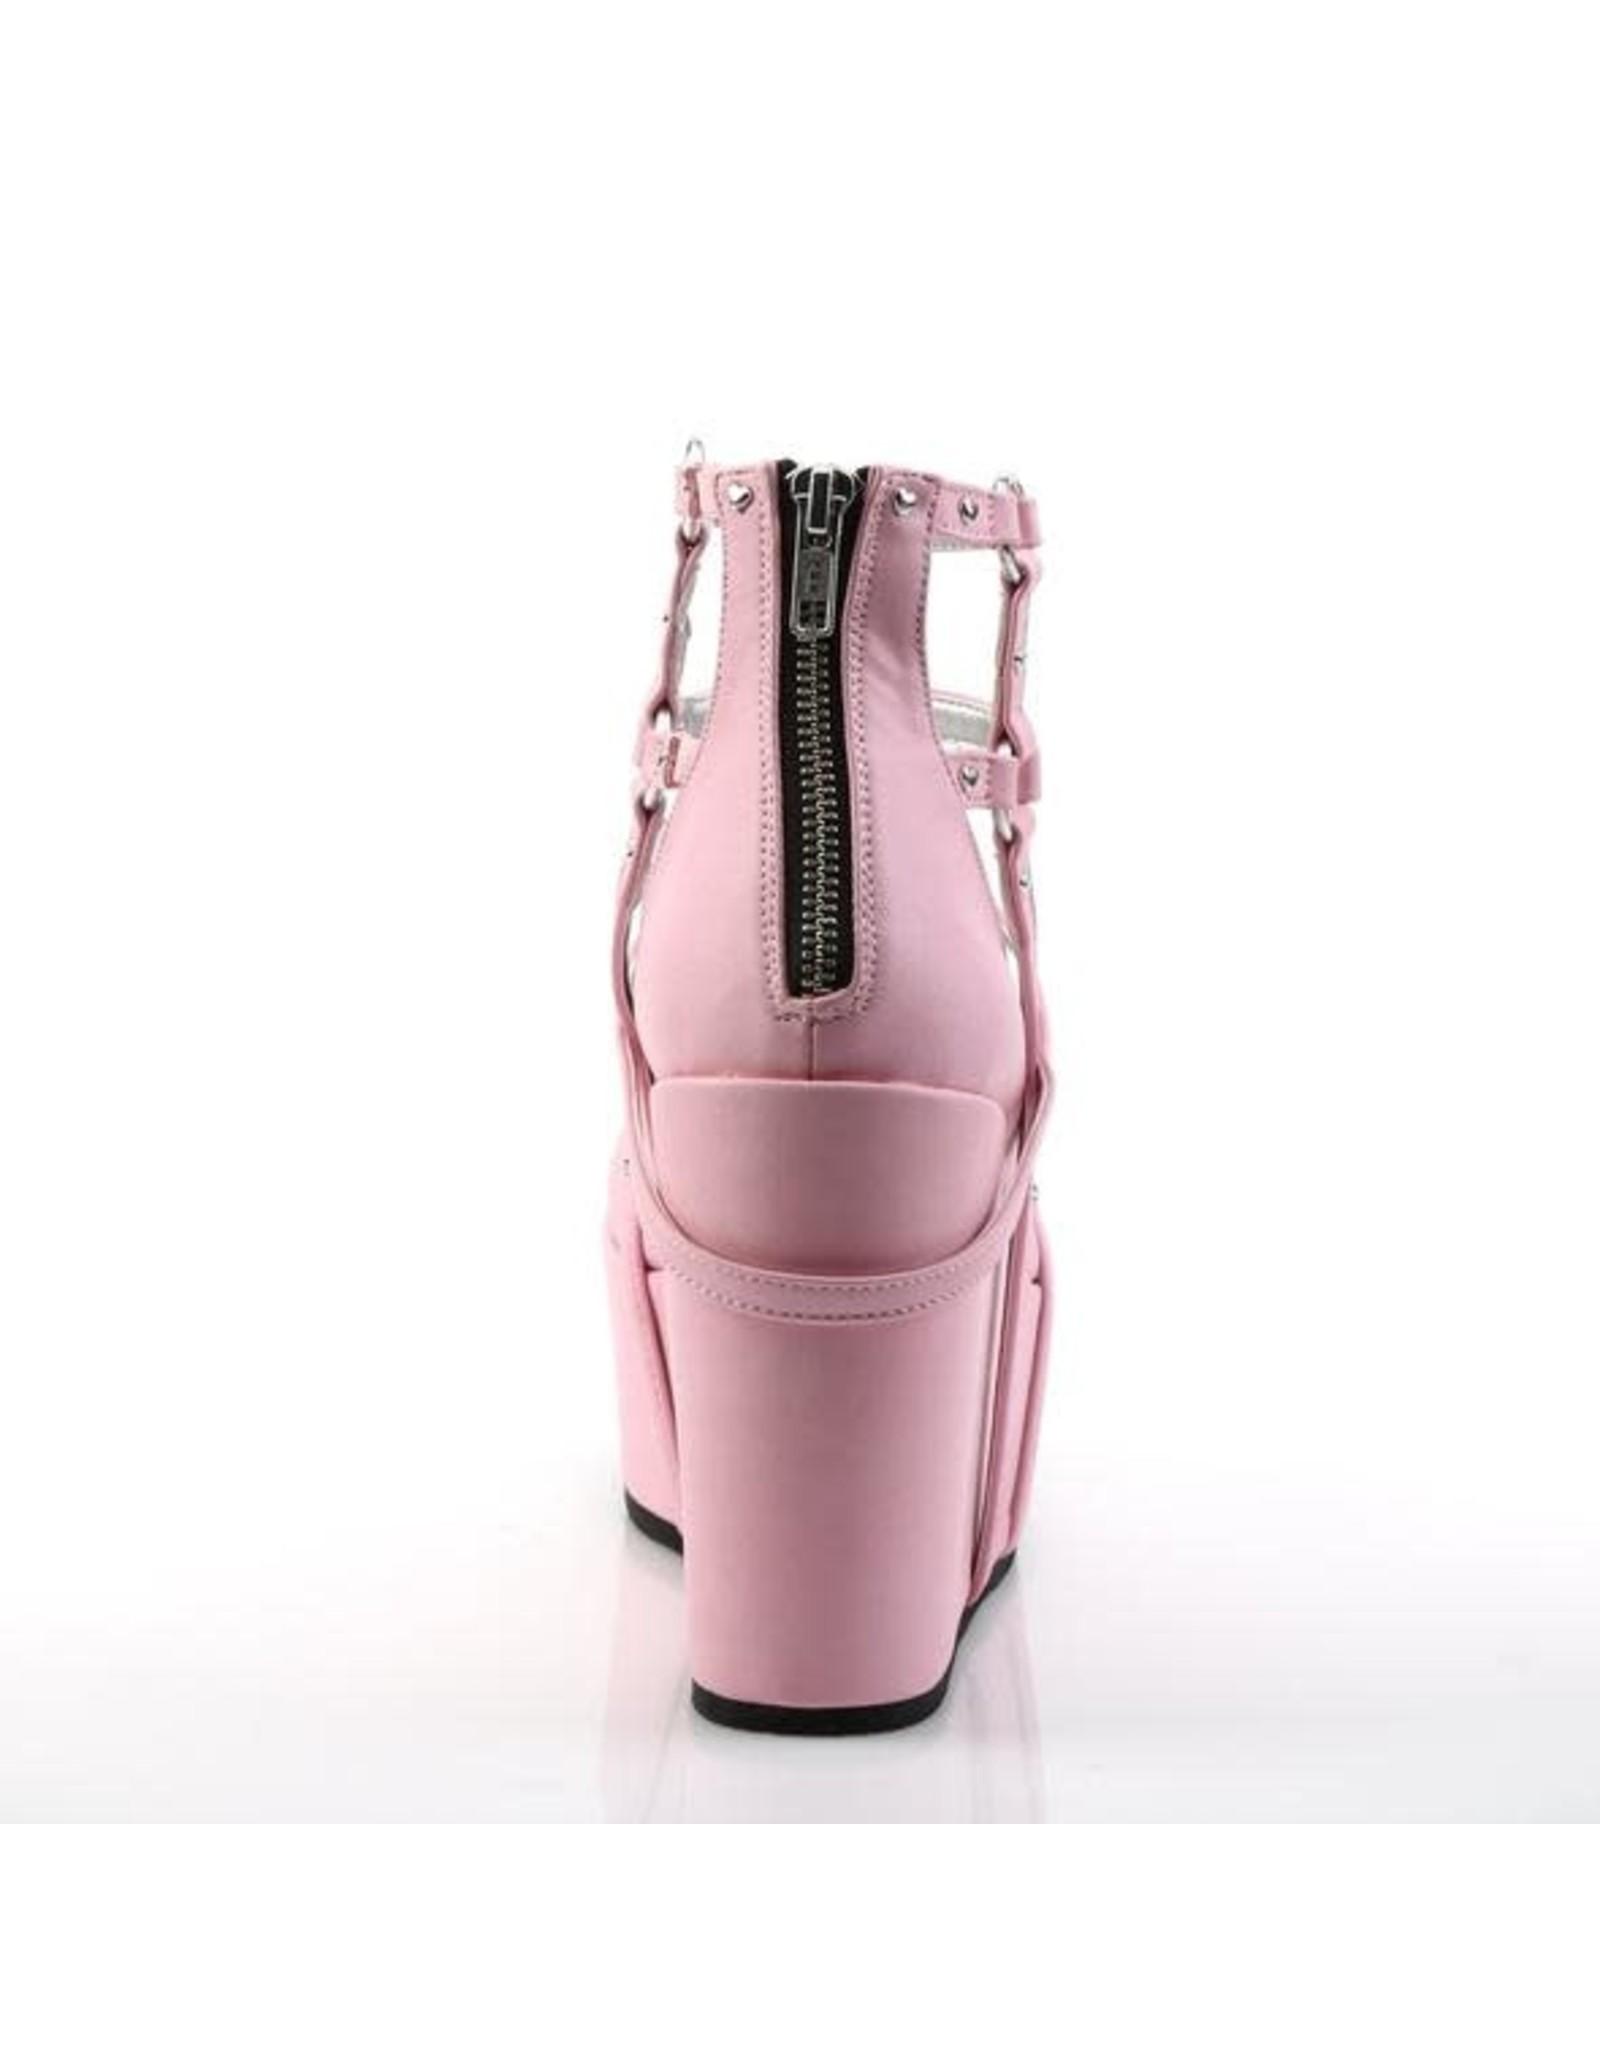 "DEMONIA POISON-25-2 5"" Wedge Platform Pink Vegan Leather Cage Bootie + Heart Studding, O-Rings & Heart-Shaped Locket D34PVC"